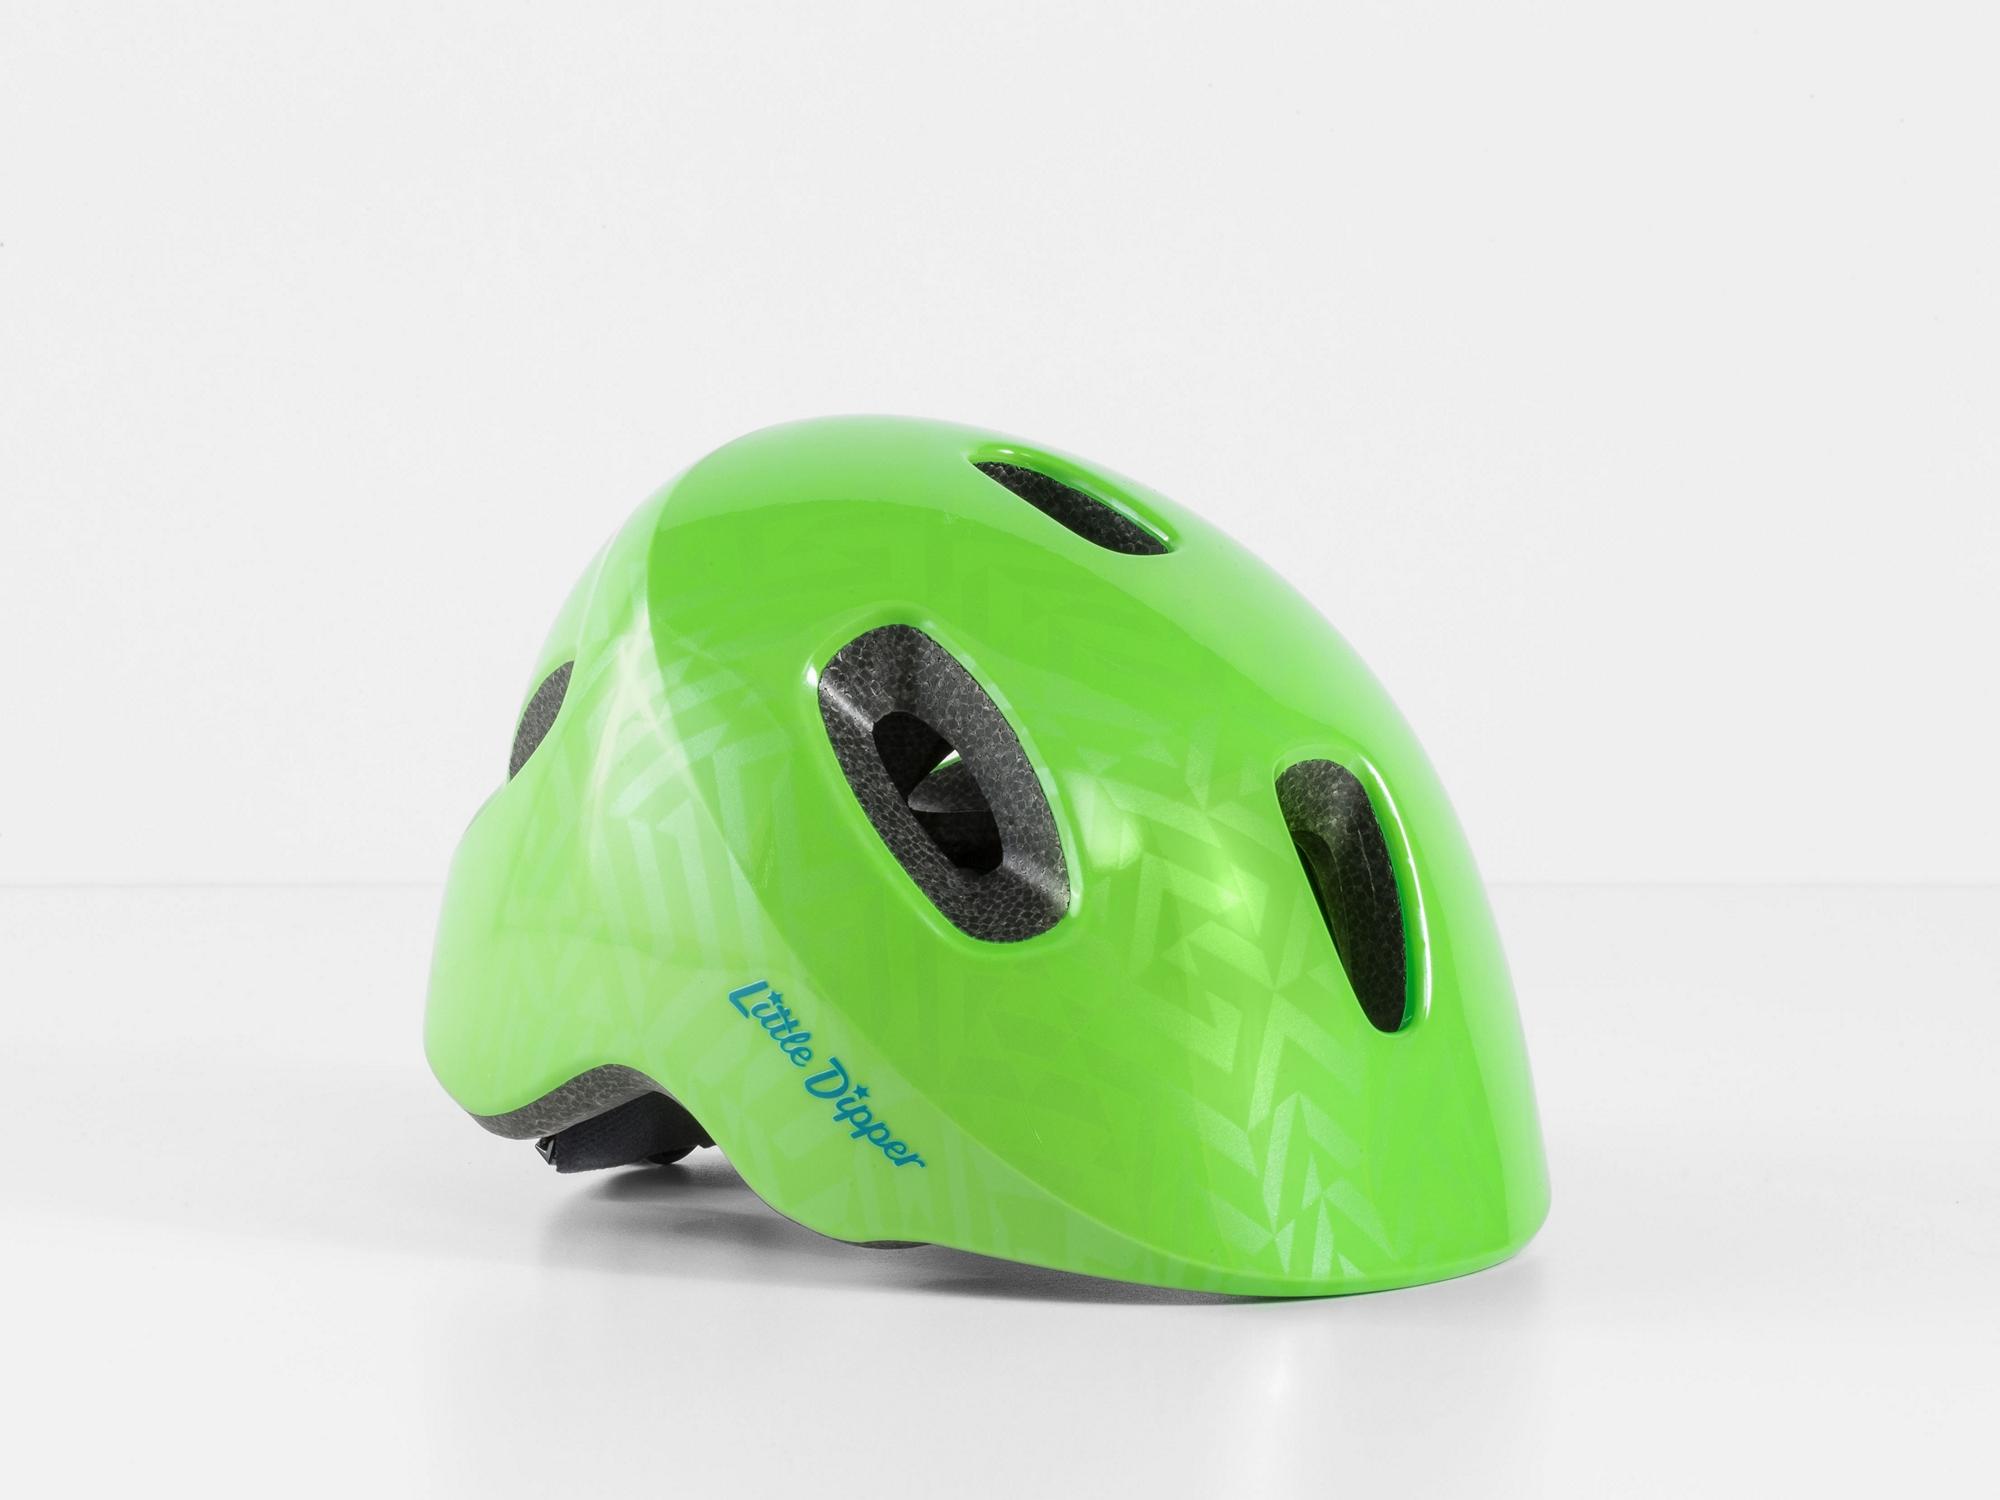 Bontrager Little Dipper Childs 46 50cm Cycling Helmet In